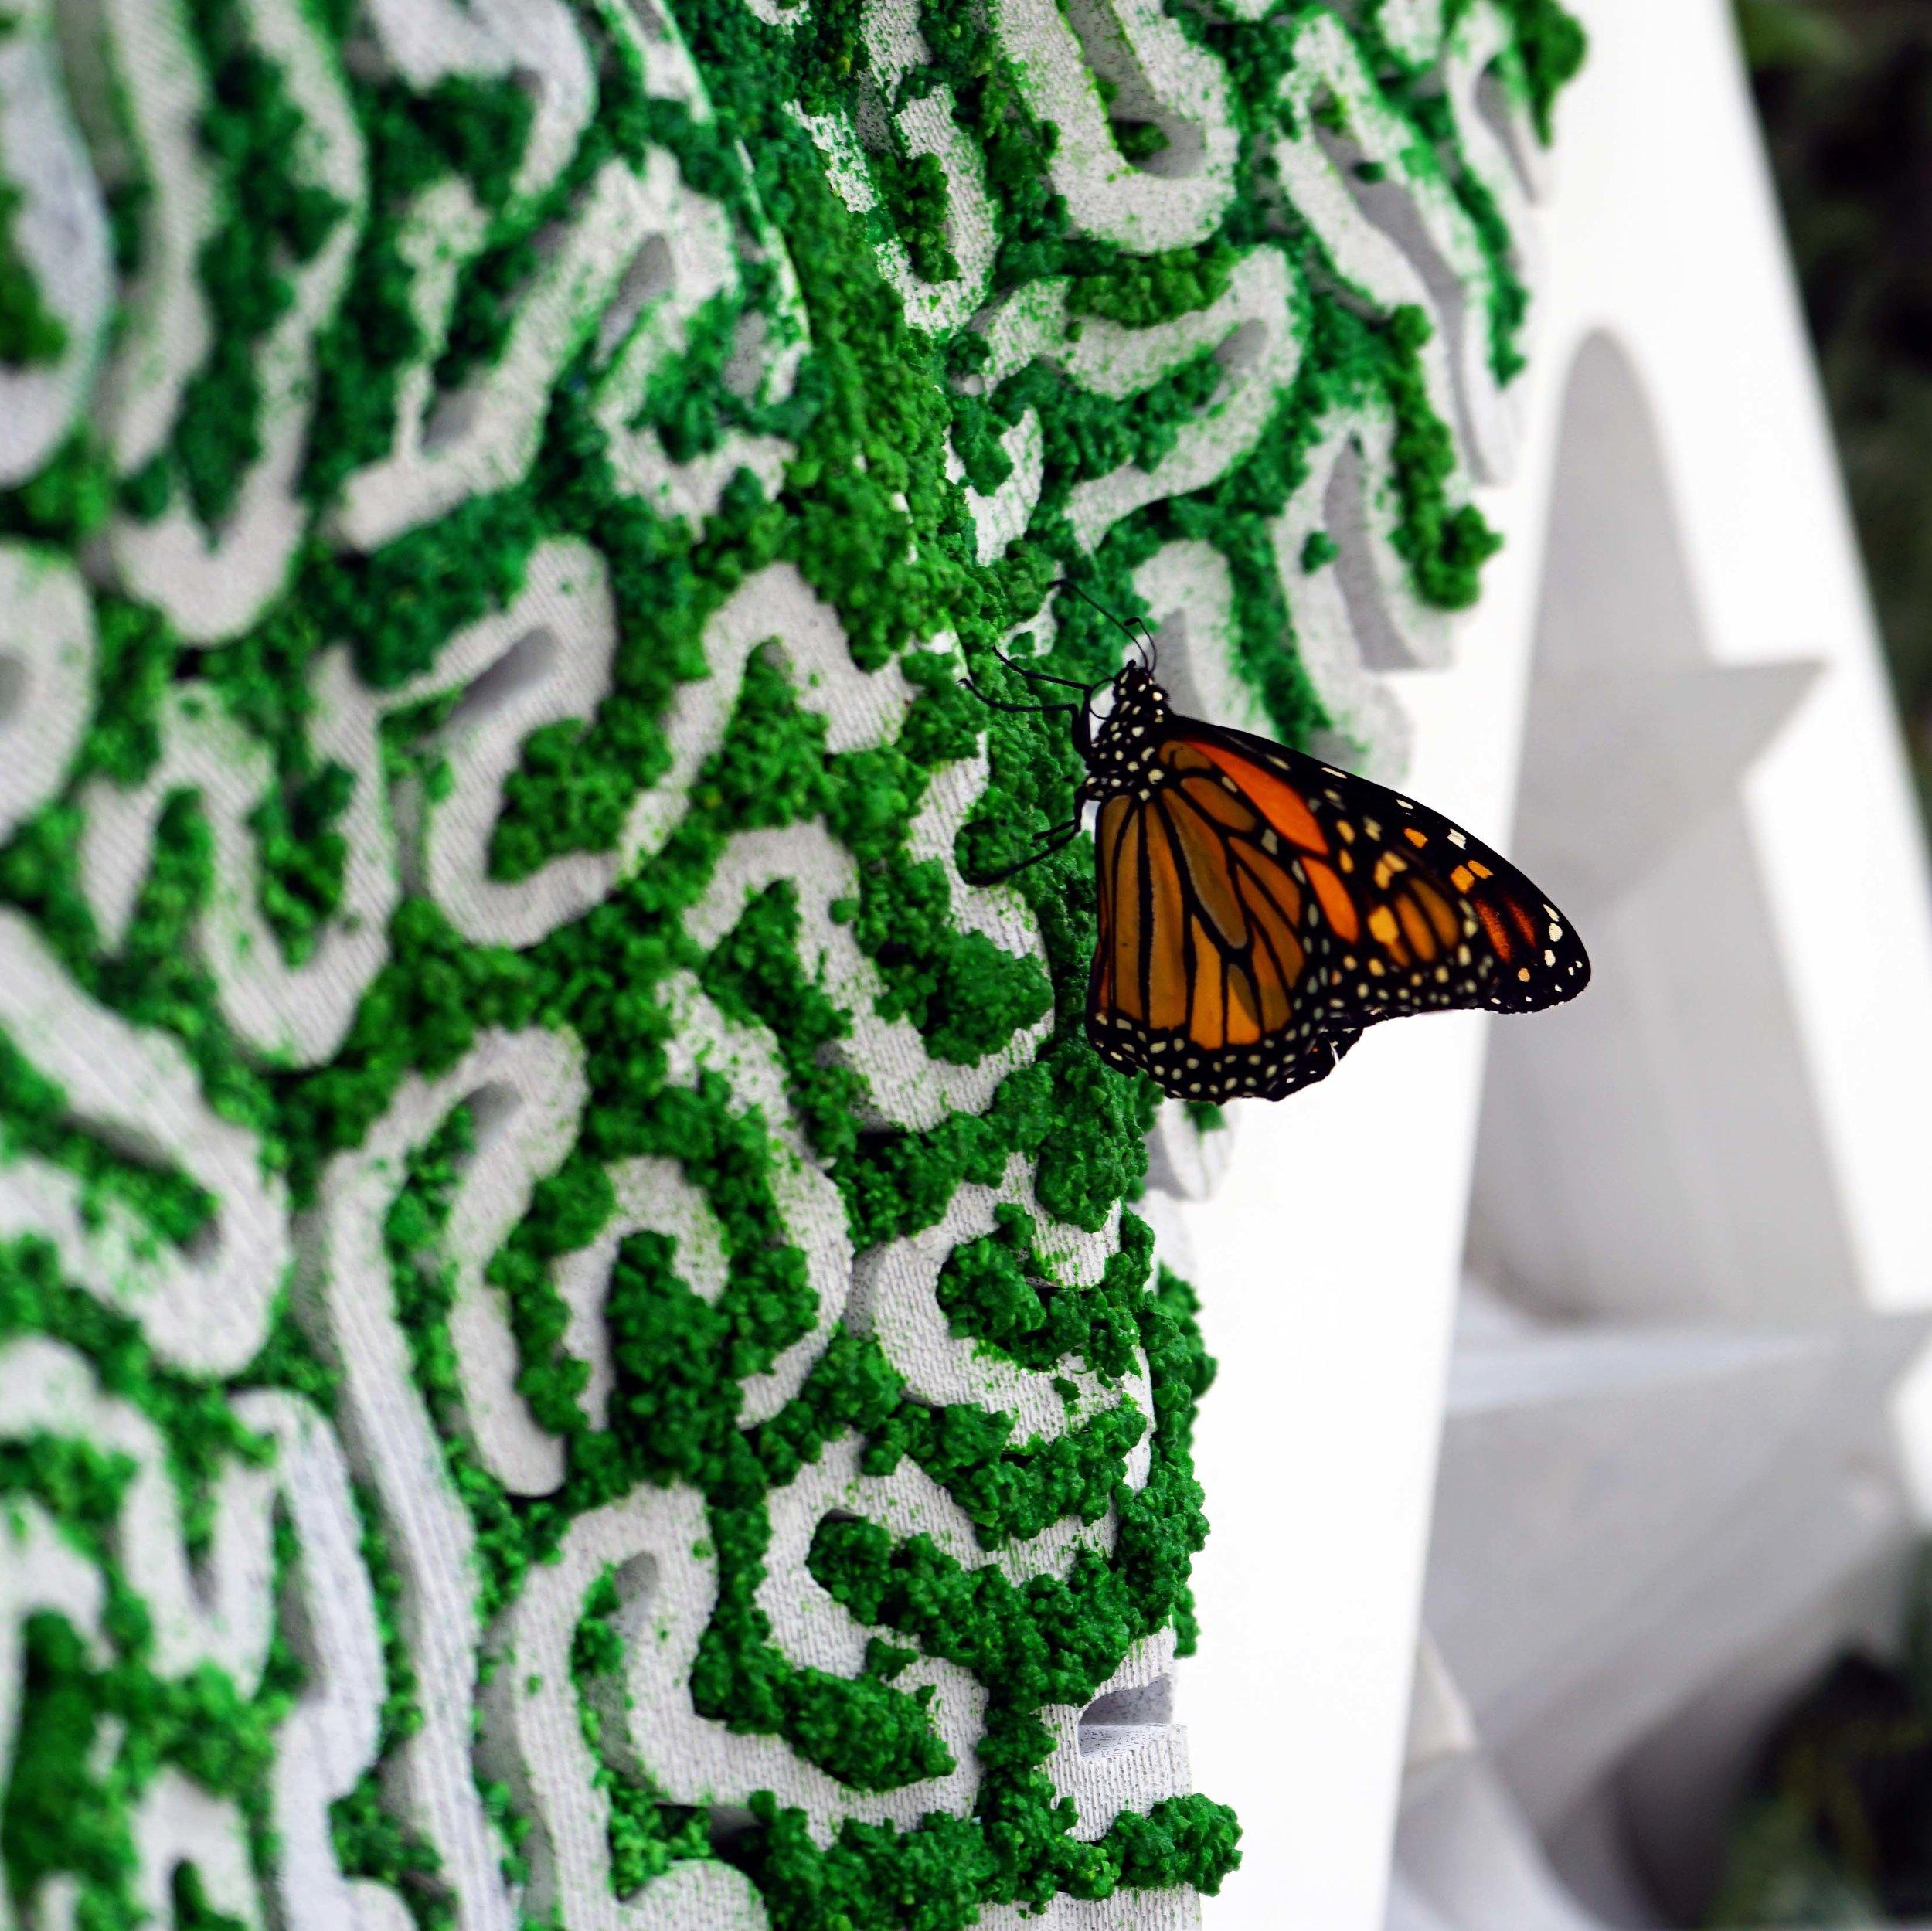 TerreformONE_MonarchSanctuary_ButterflyonMossPanel2.jpg